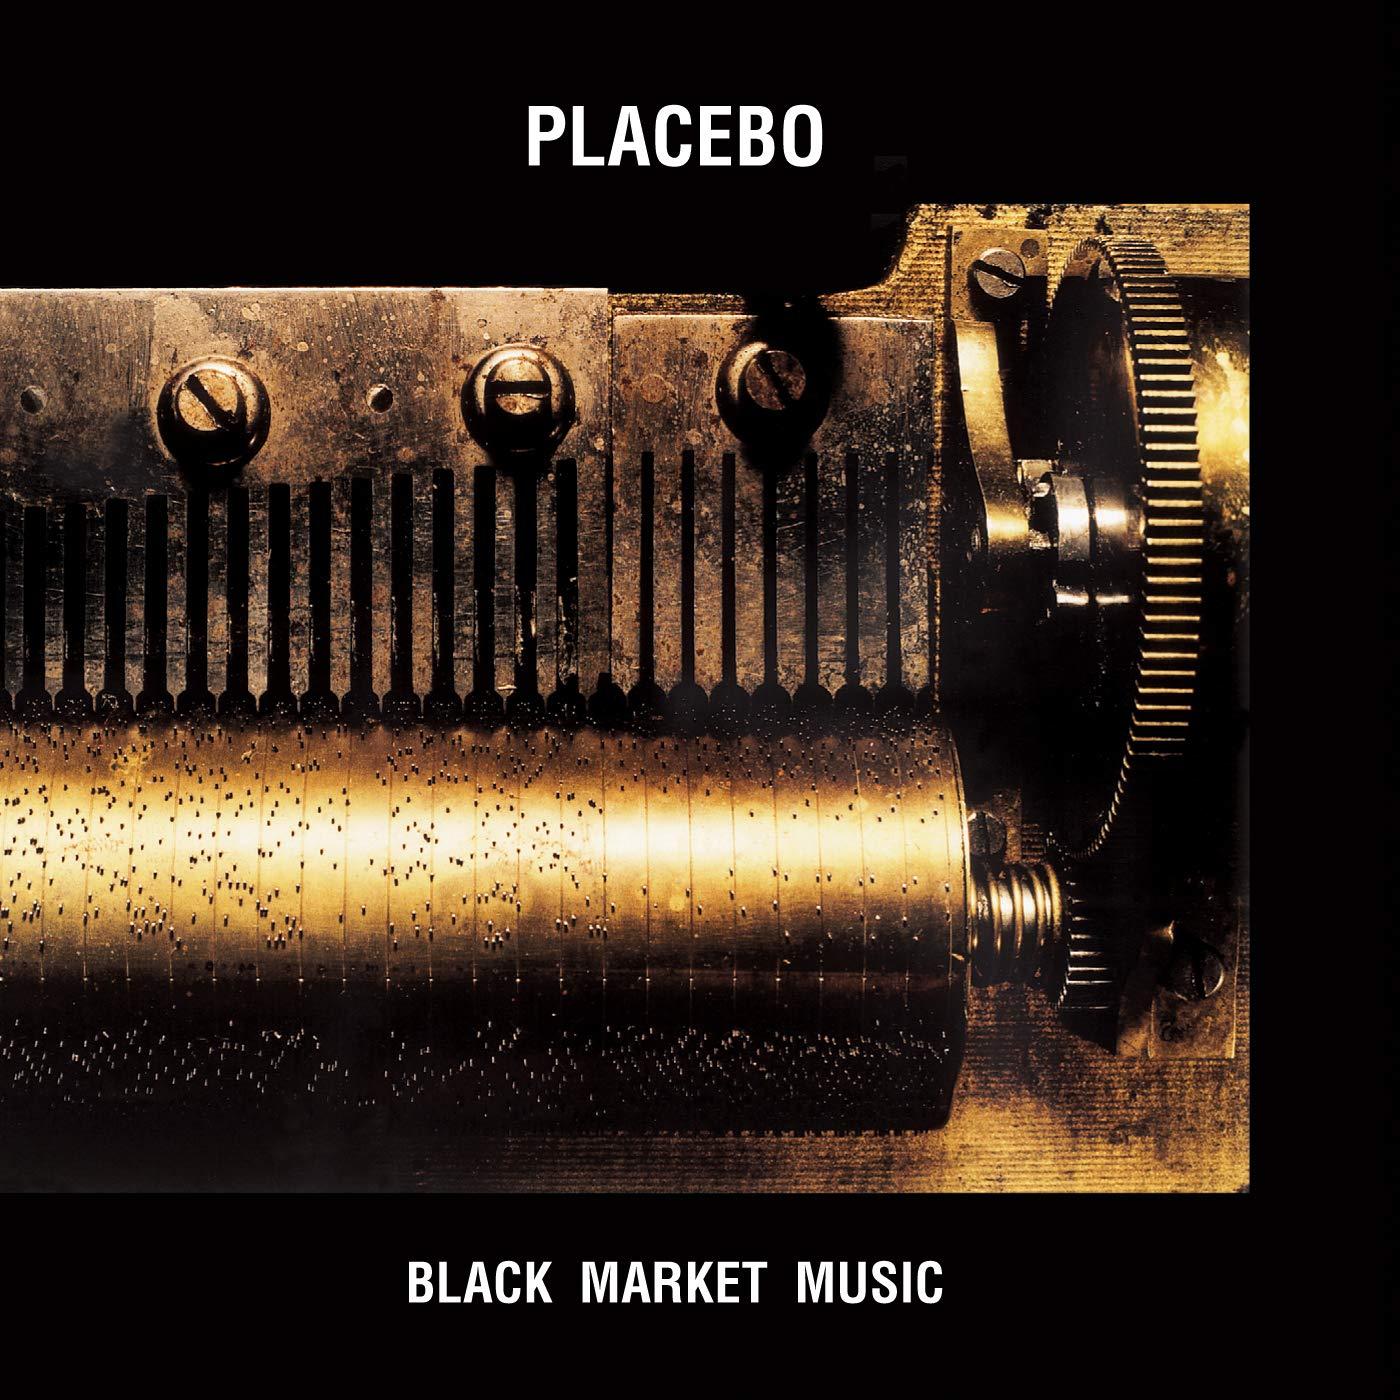 Placebo - Black Market Music [VINYL] explicit_lyrics LP now £11.99 (Prime) + £2.99 (non Prime) at Amazon